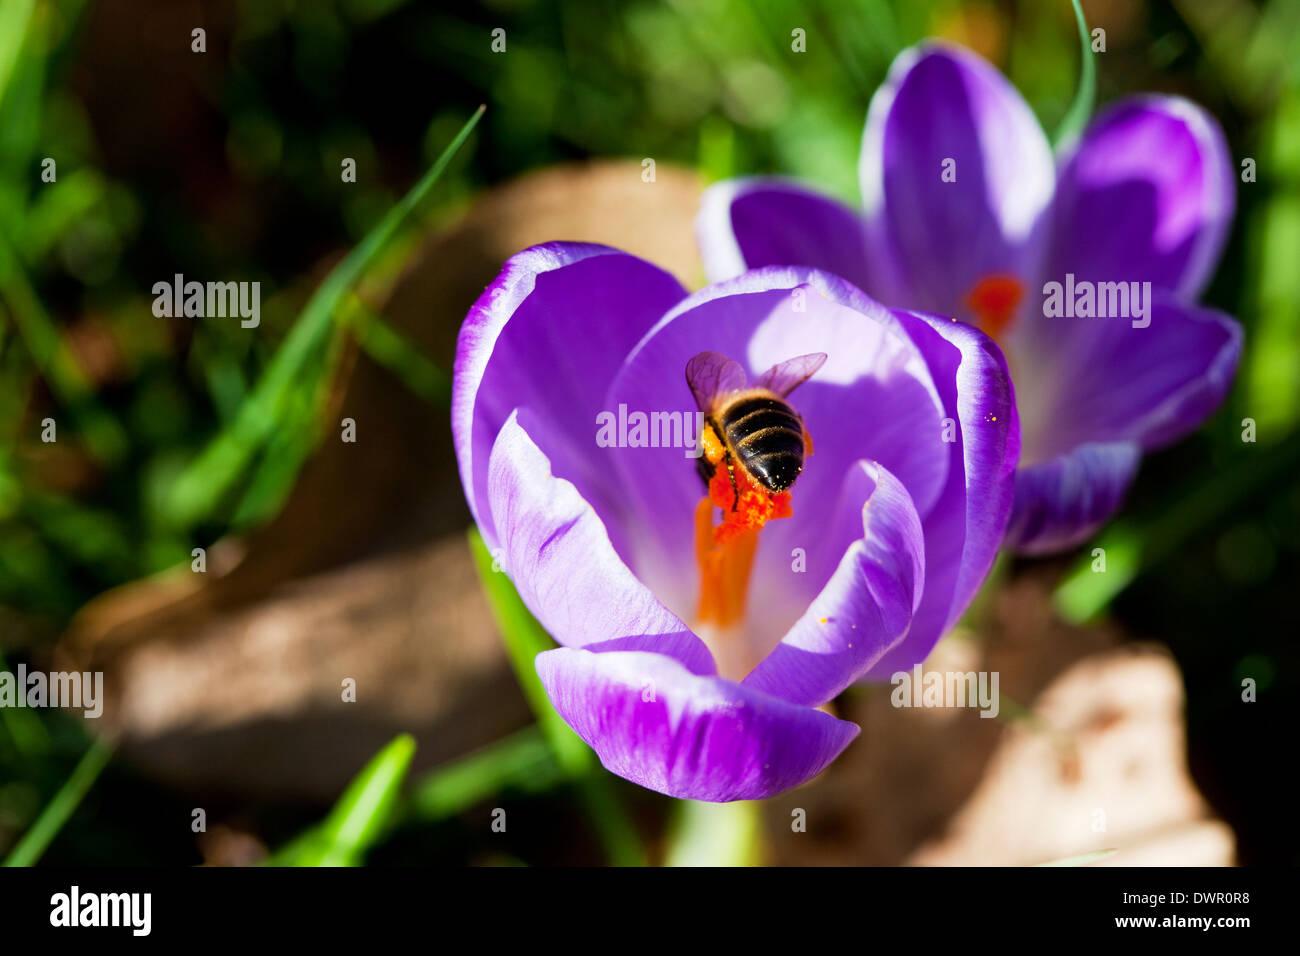 Honey bee on a purple crocus in spring, England, UK - Stock Image